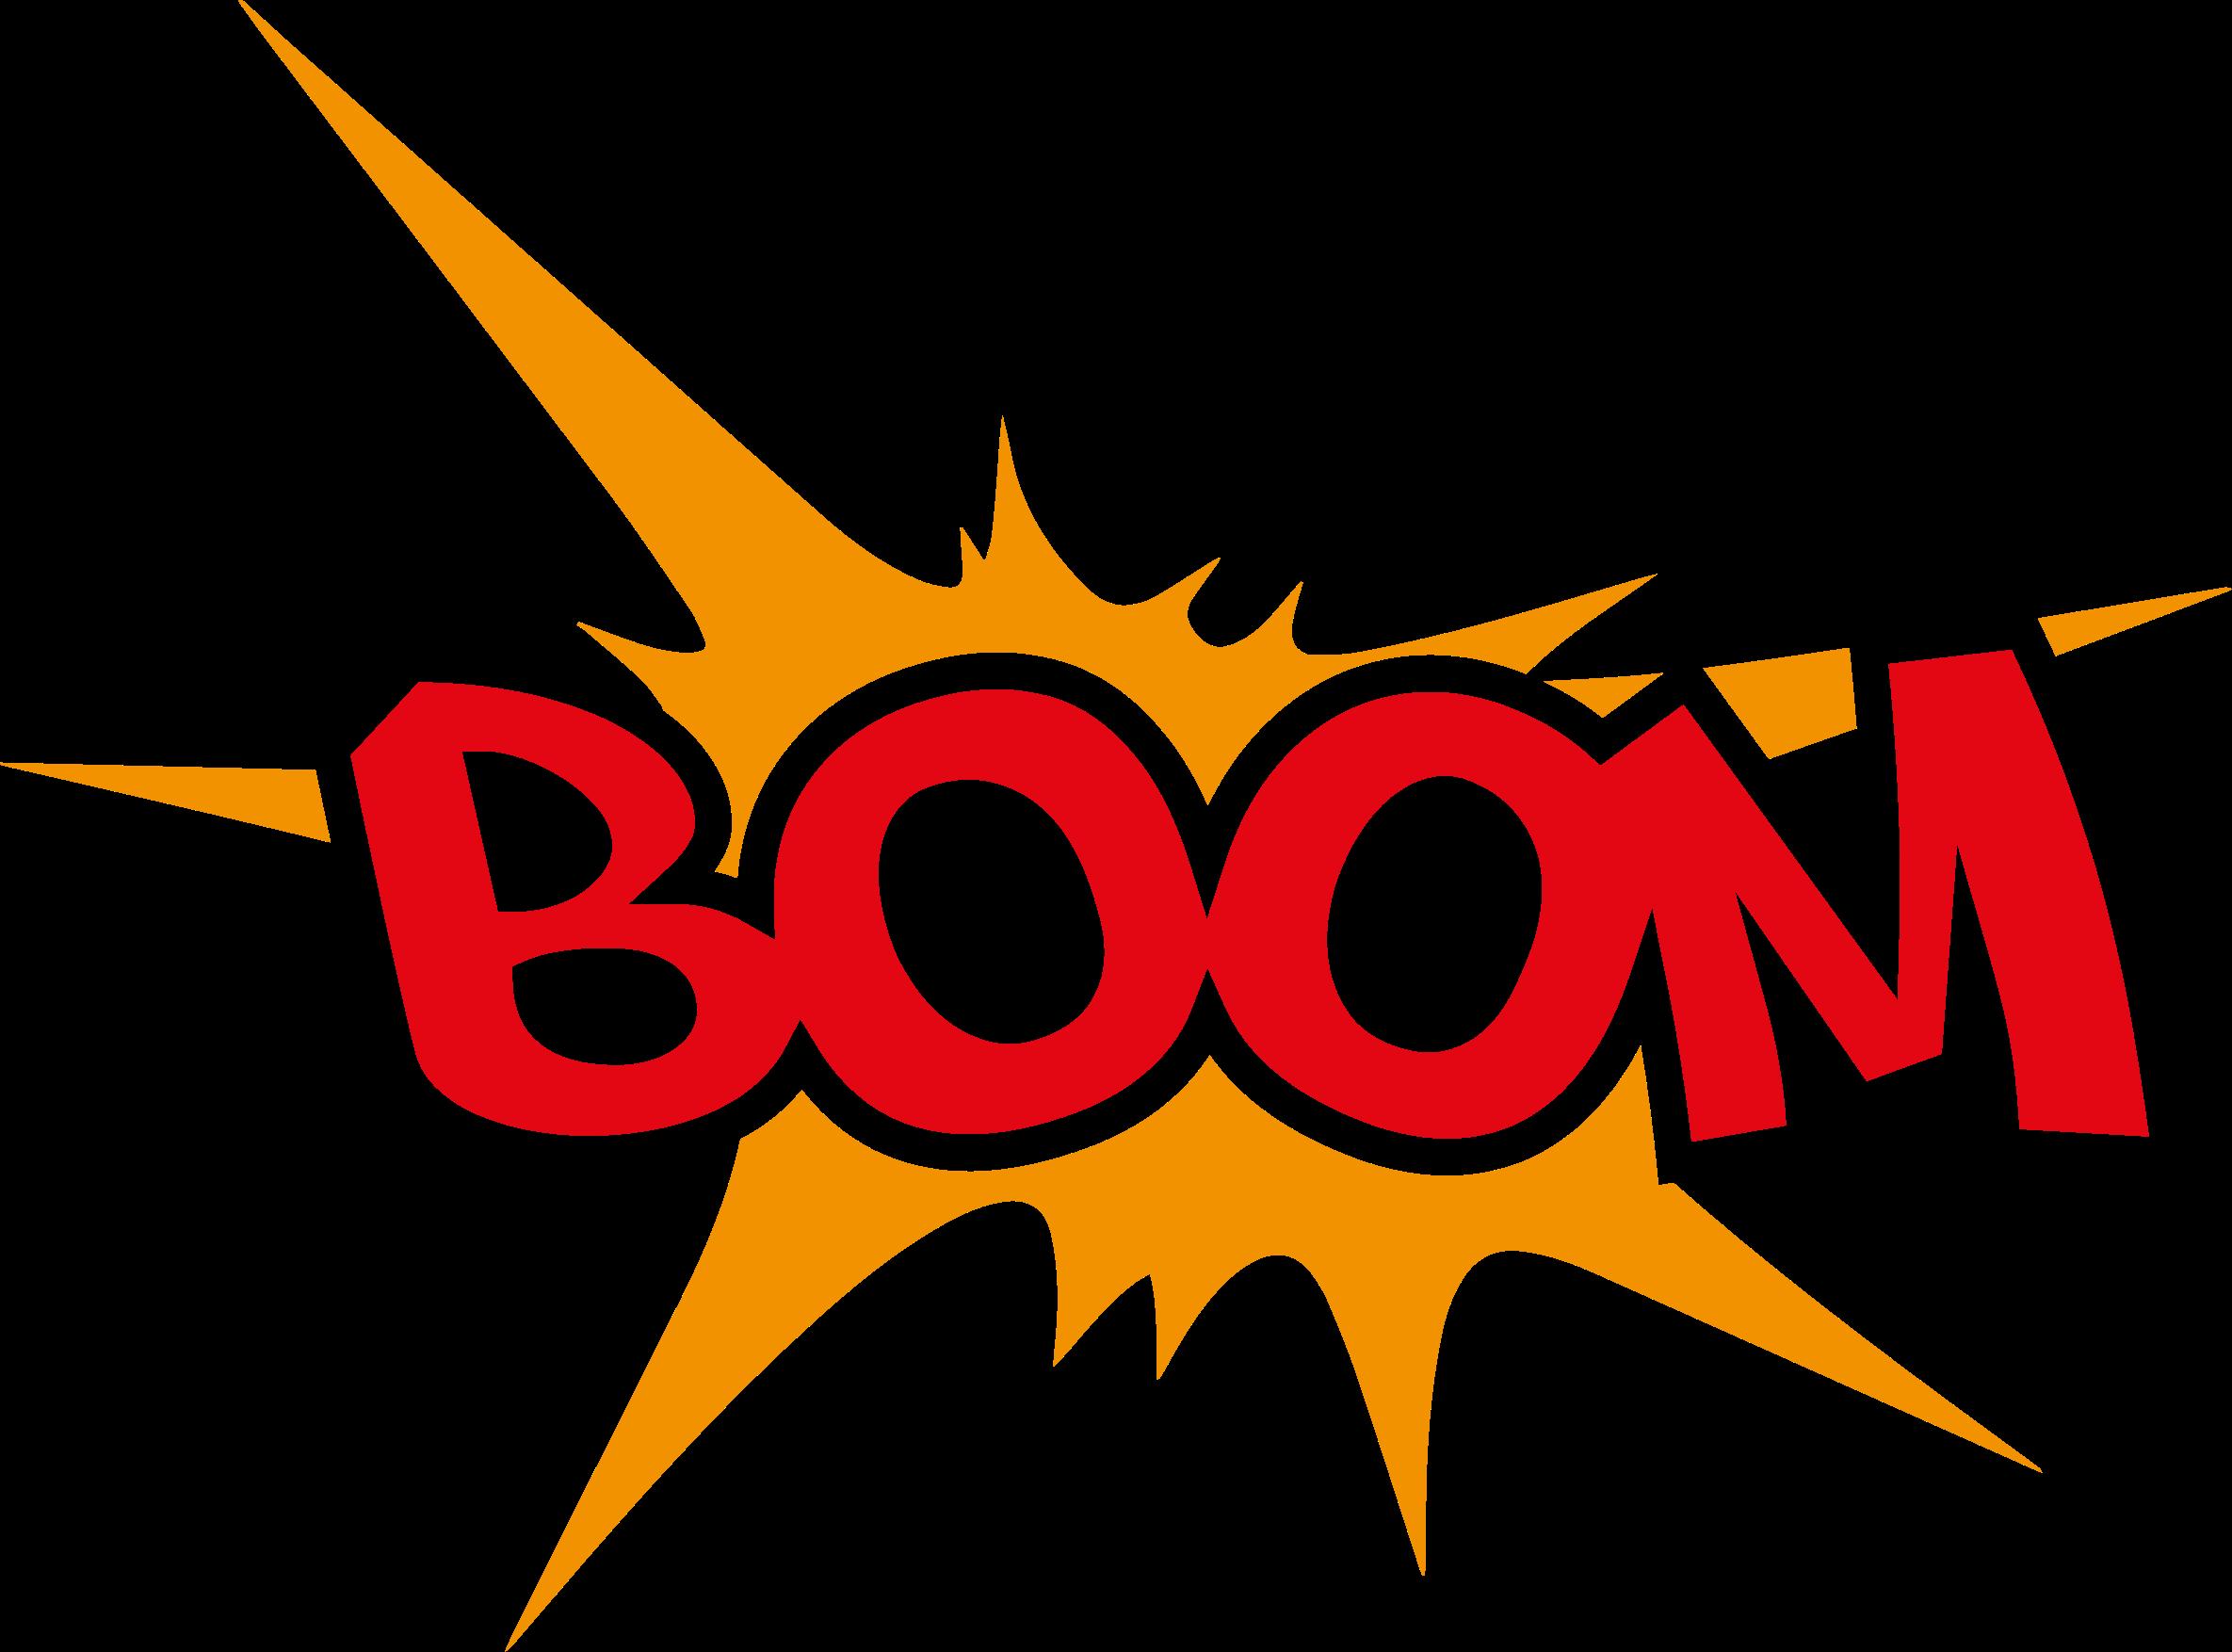 Boom clipart Clipart Clipart Boom Panda boom%20clipart